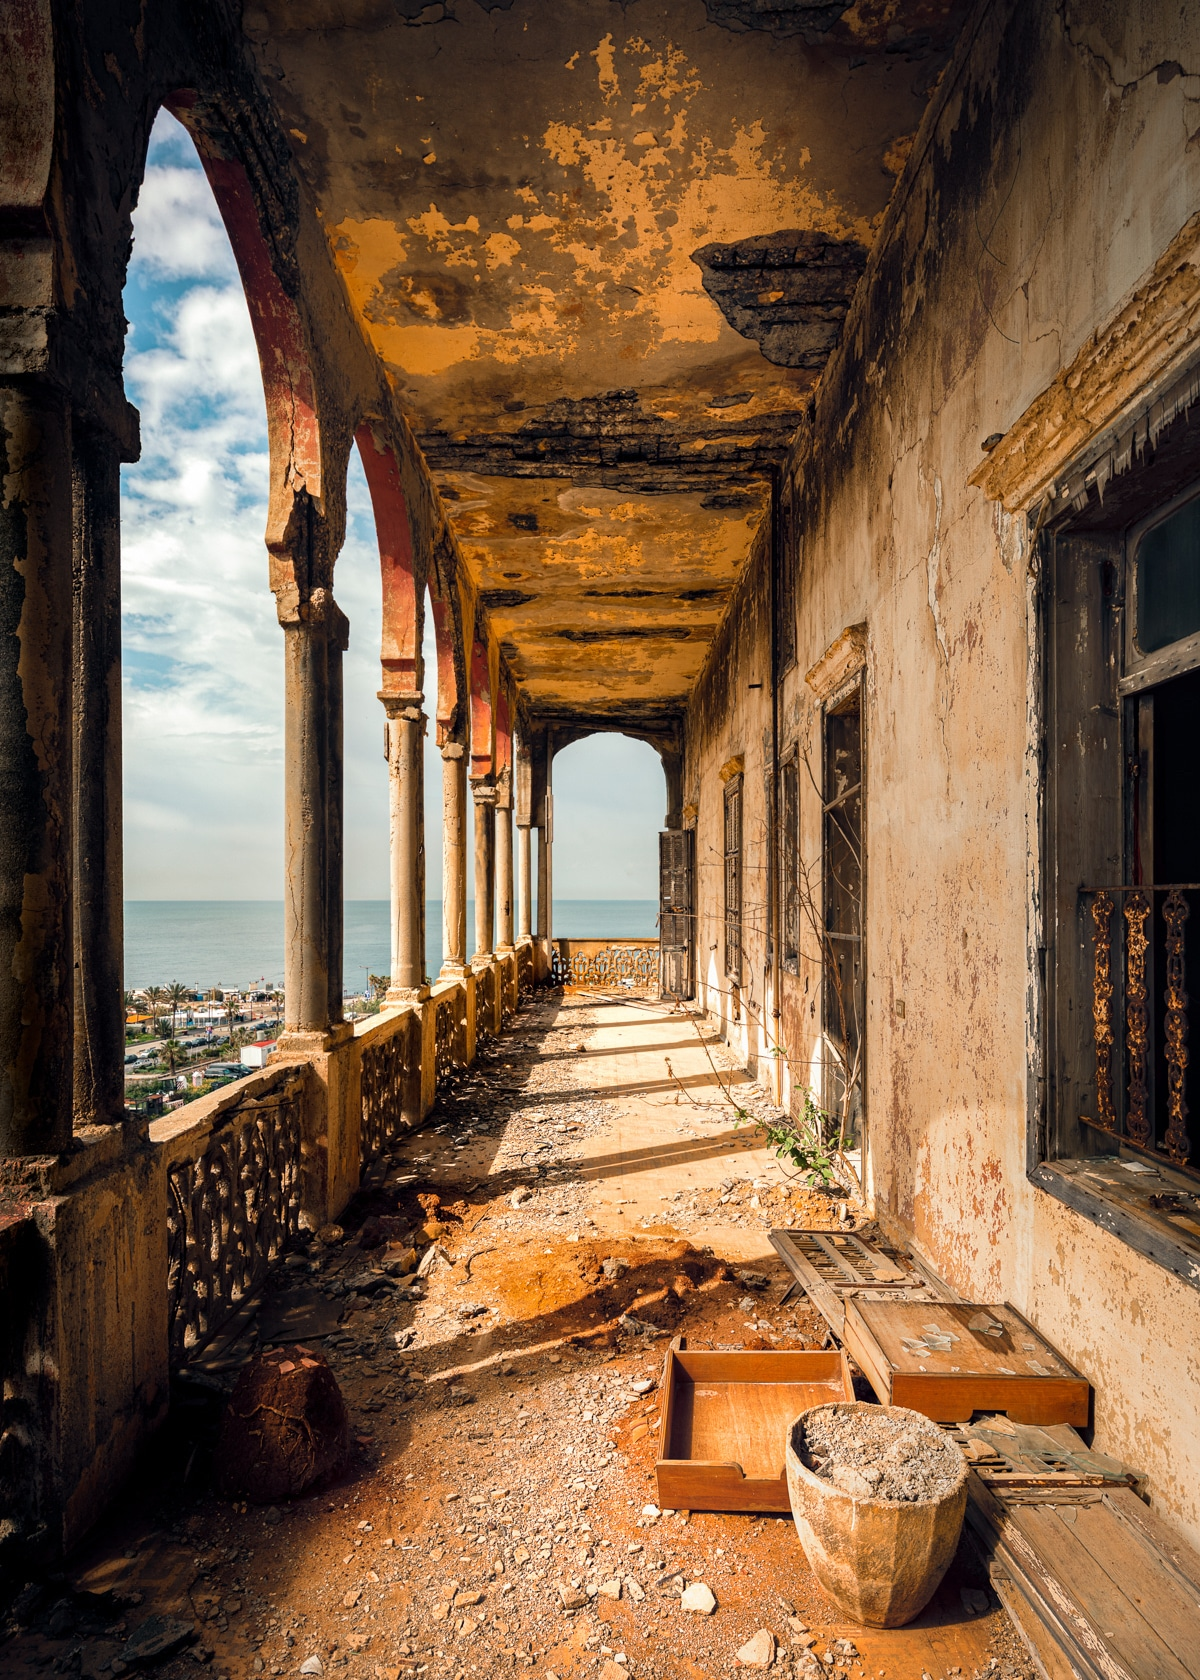 Building Damaged During Civil War in Beirut